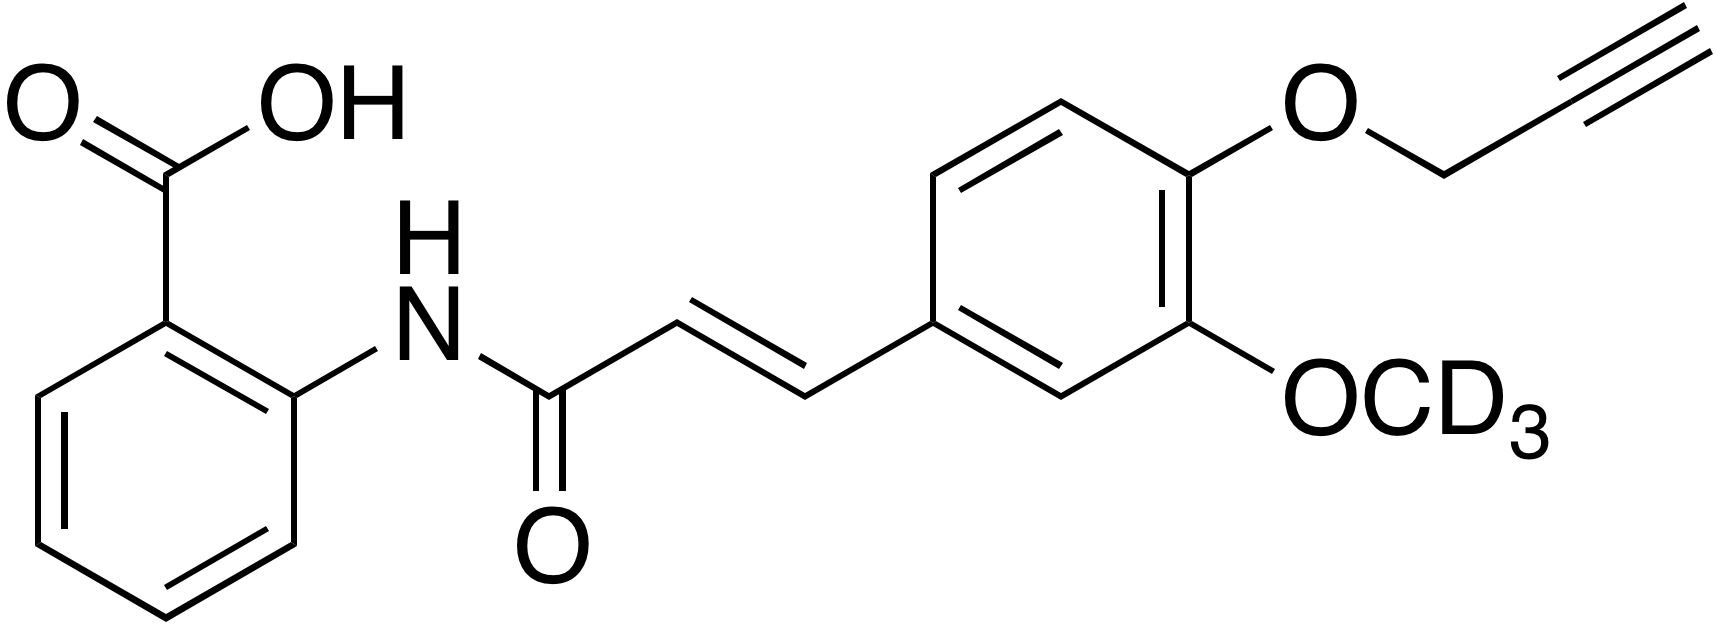 3-Methoxy-d<sub>3</sub>-4-propargyloxycinnamoyl anthranilate